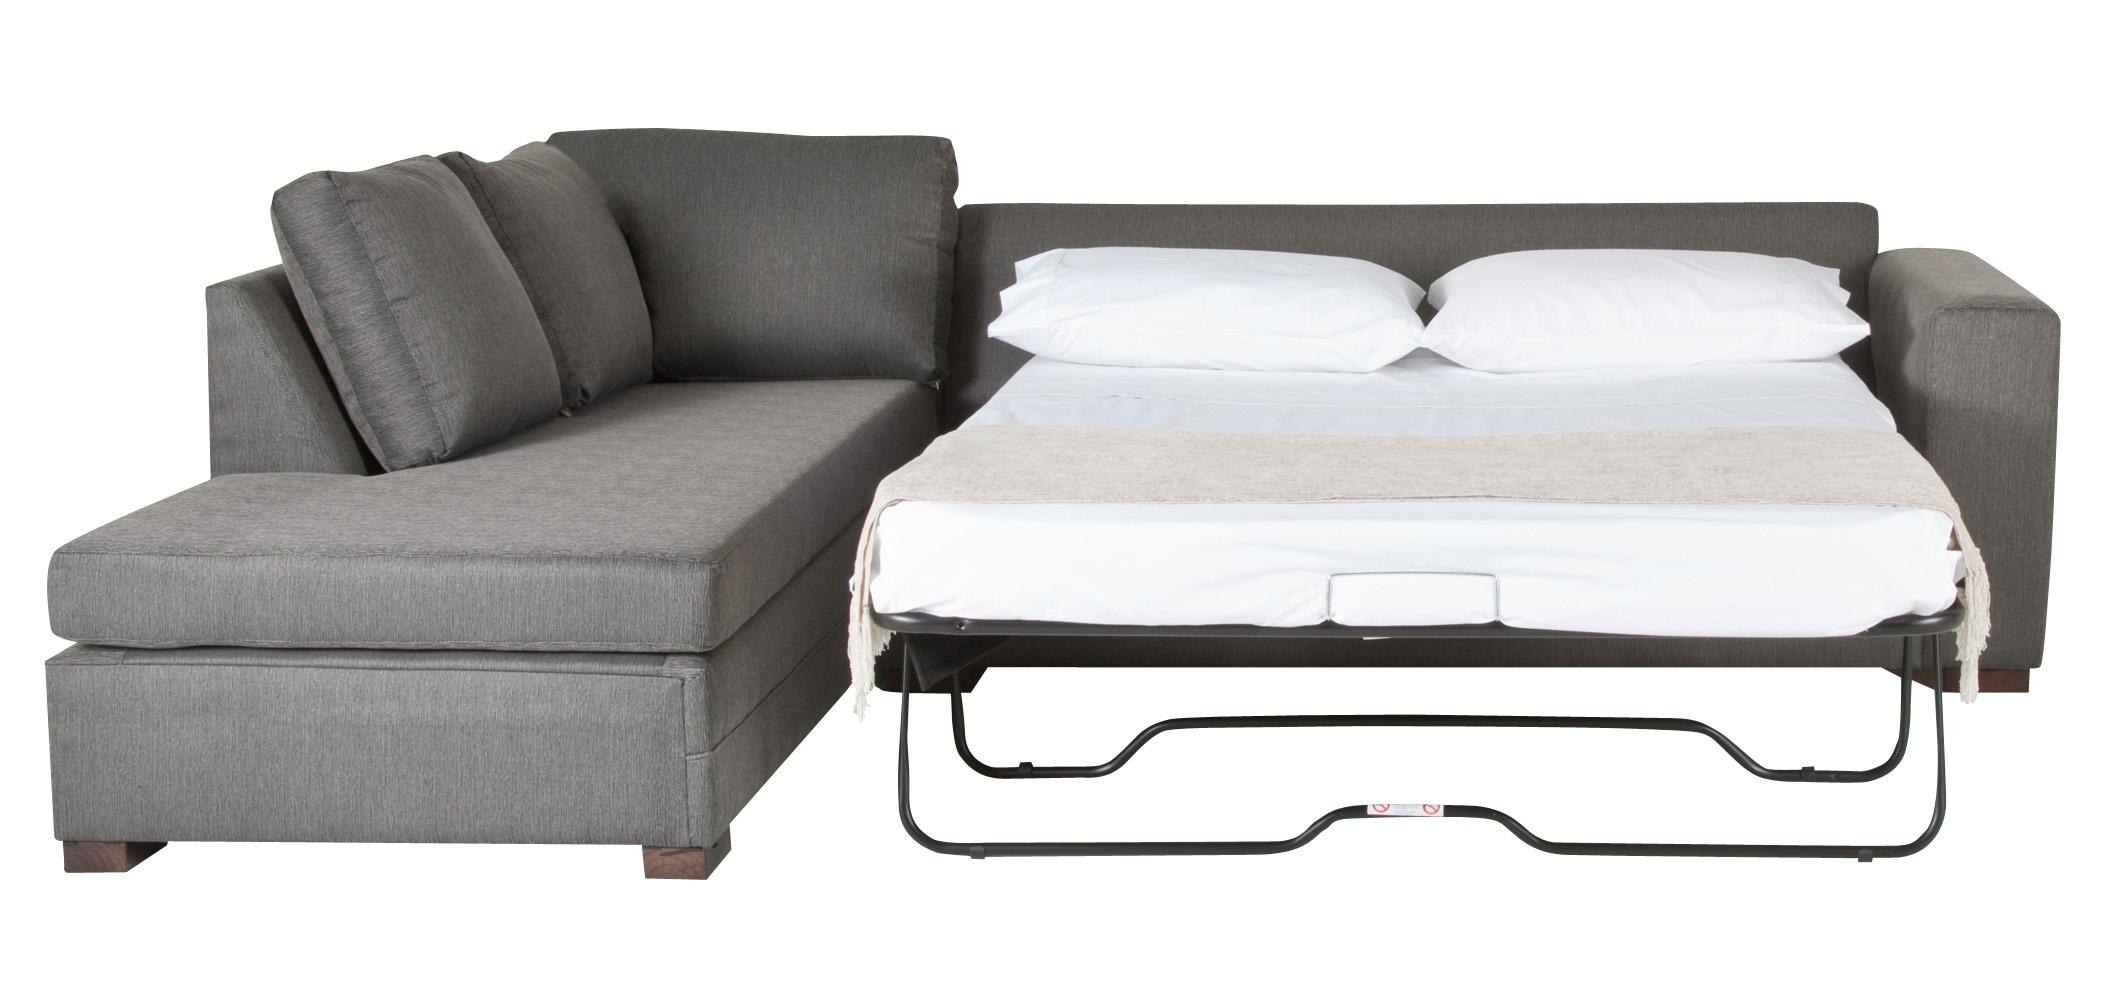 Sofa Sleeper For Sale – 100 Images – Loveseat Sofa Sleepers Sofa In Ikea Sectional Sleeper Sofas (Image 9 of 10)